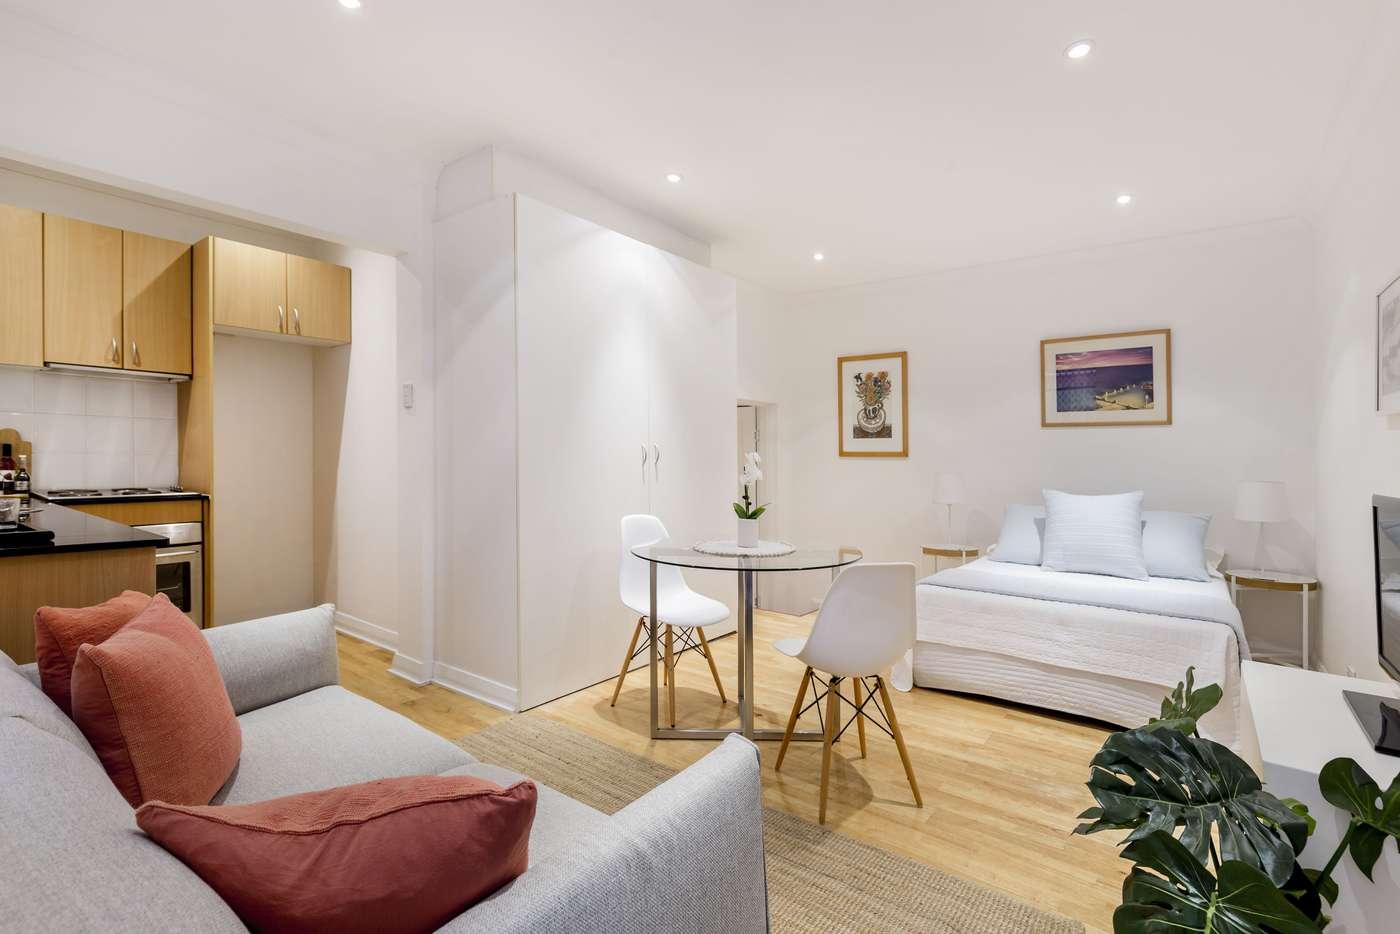 Main view of Homely studio listing, 103/9 Greenknowe Avenue, Elizabeth Bay NSW 2011